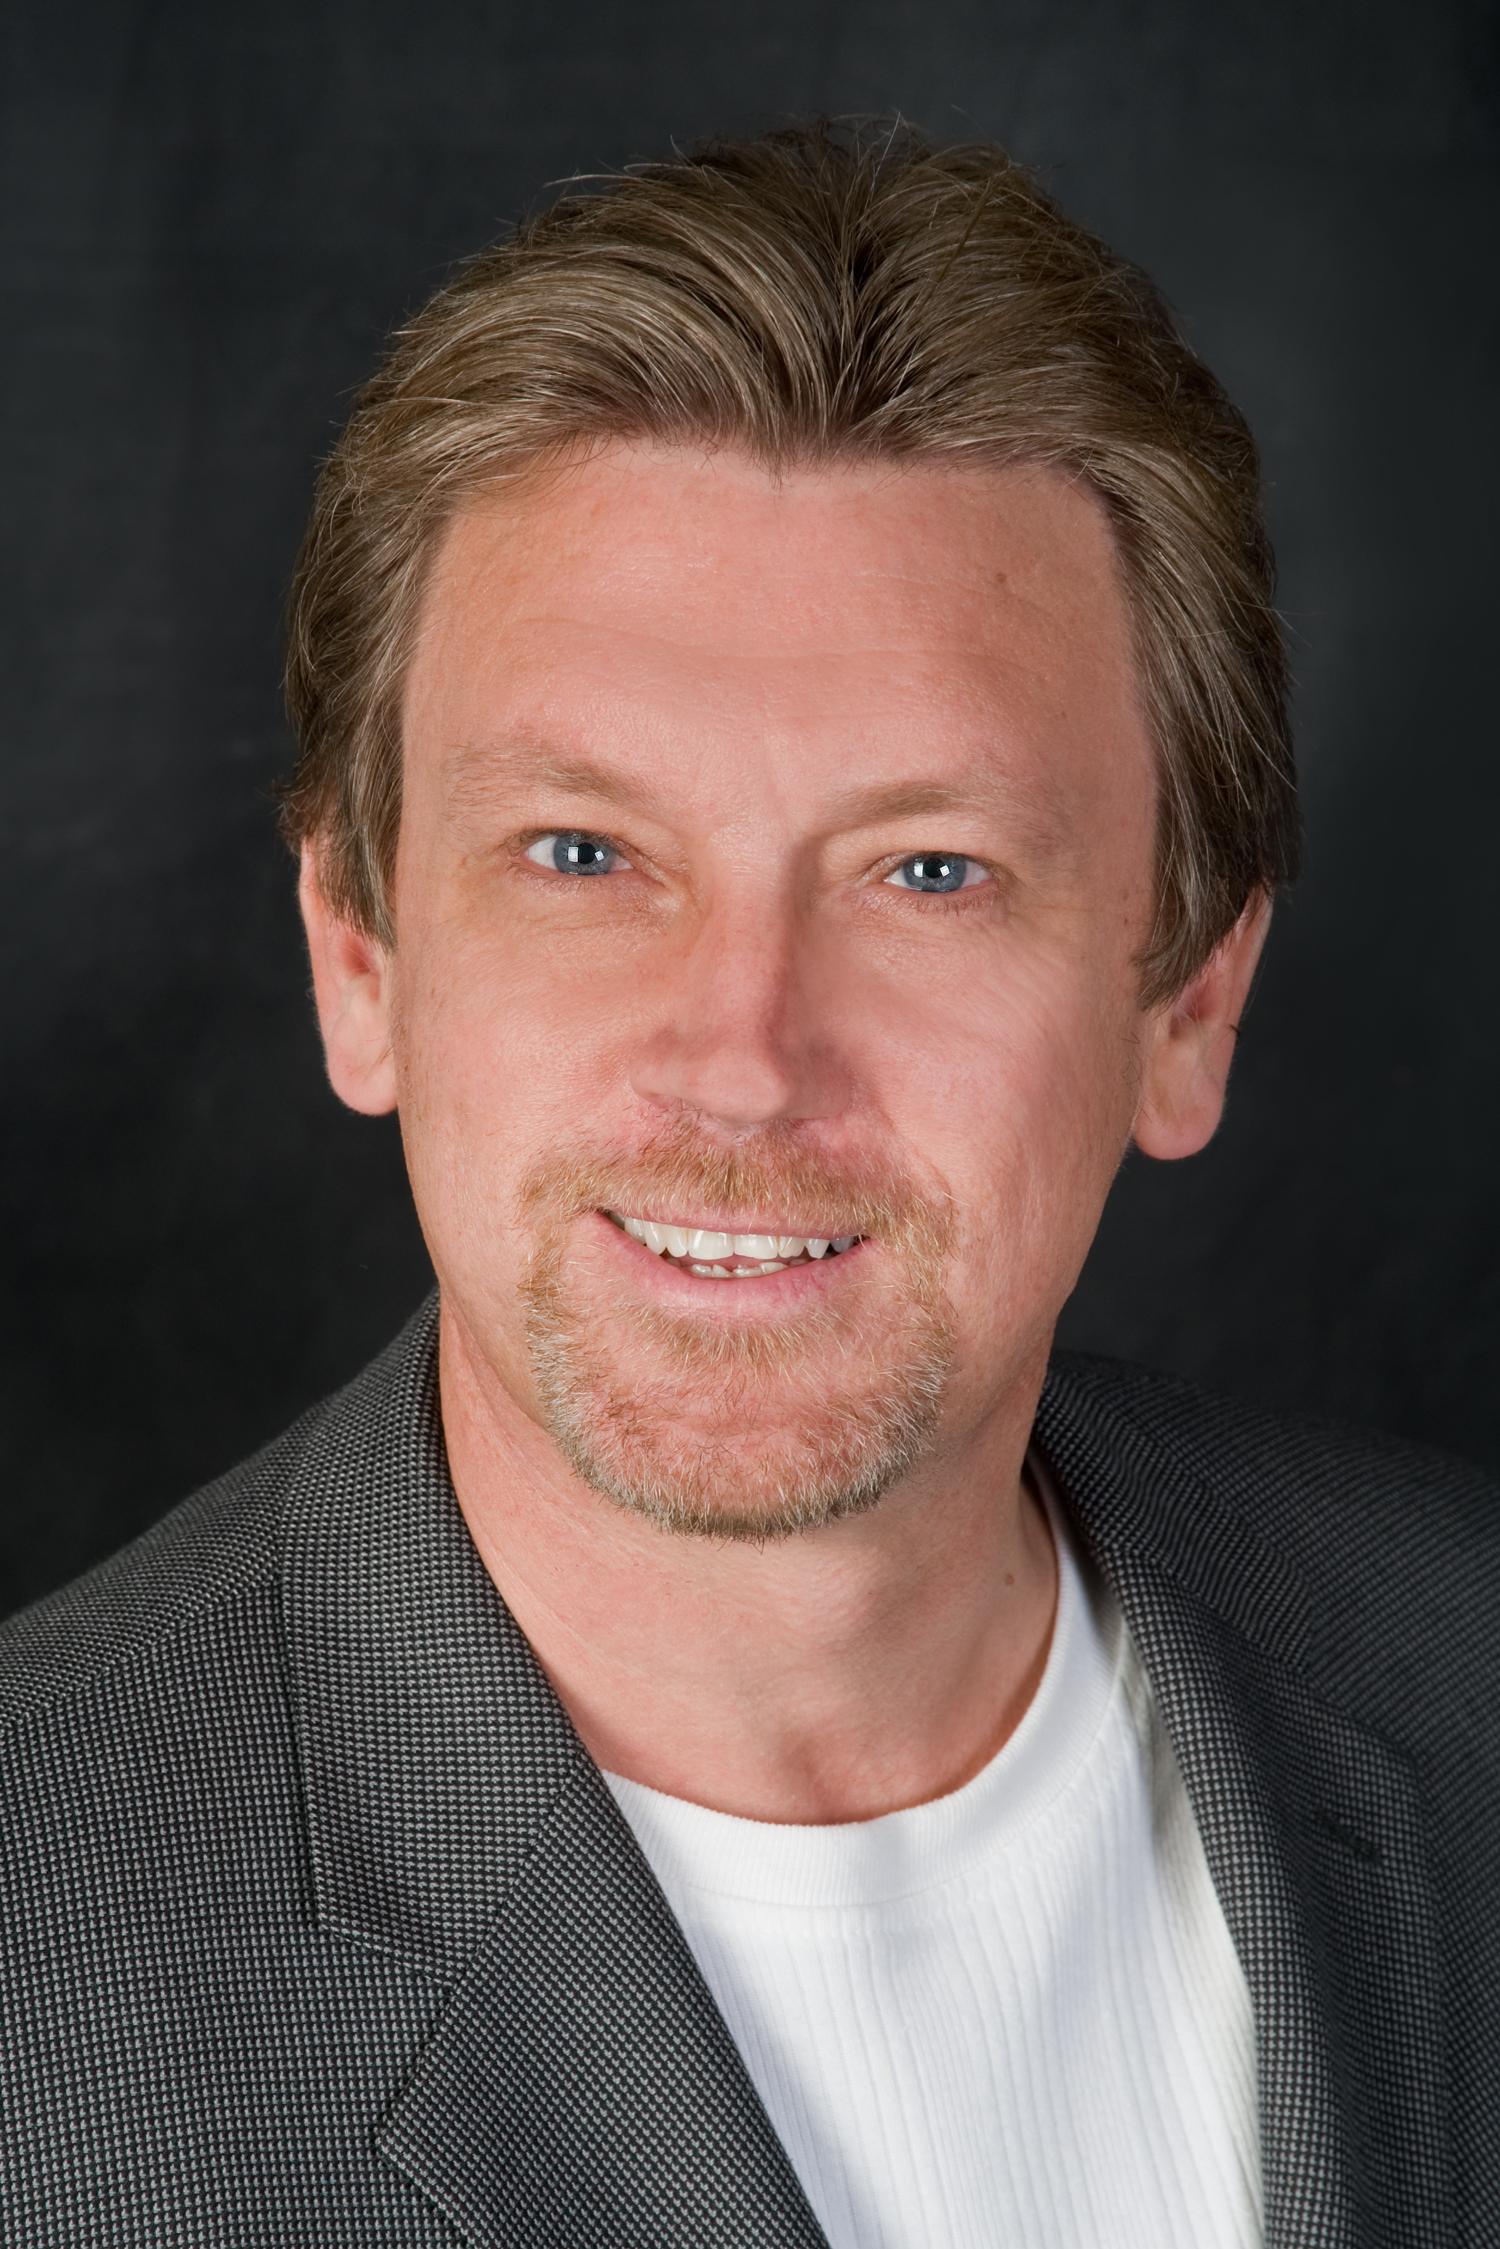 Larry Arth, Managing Partner